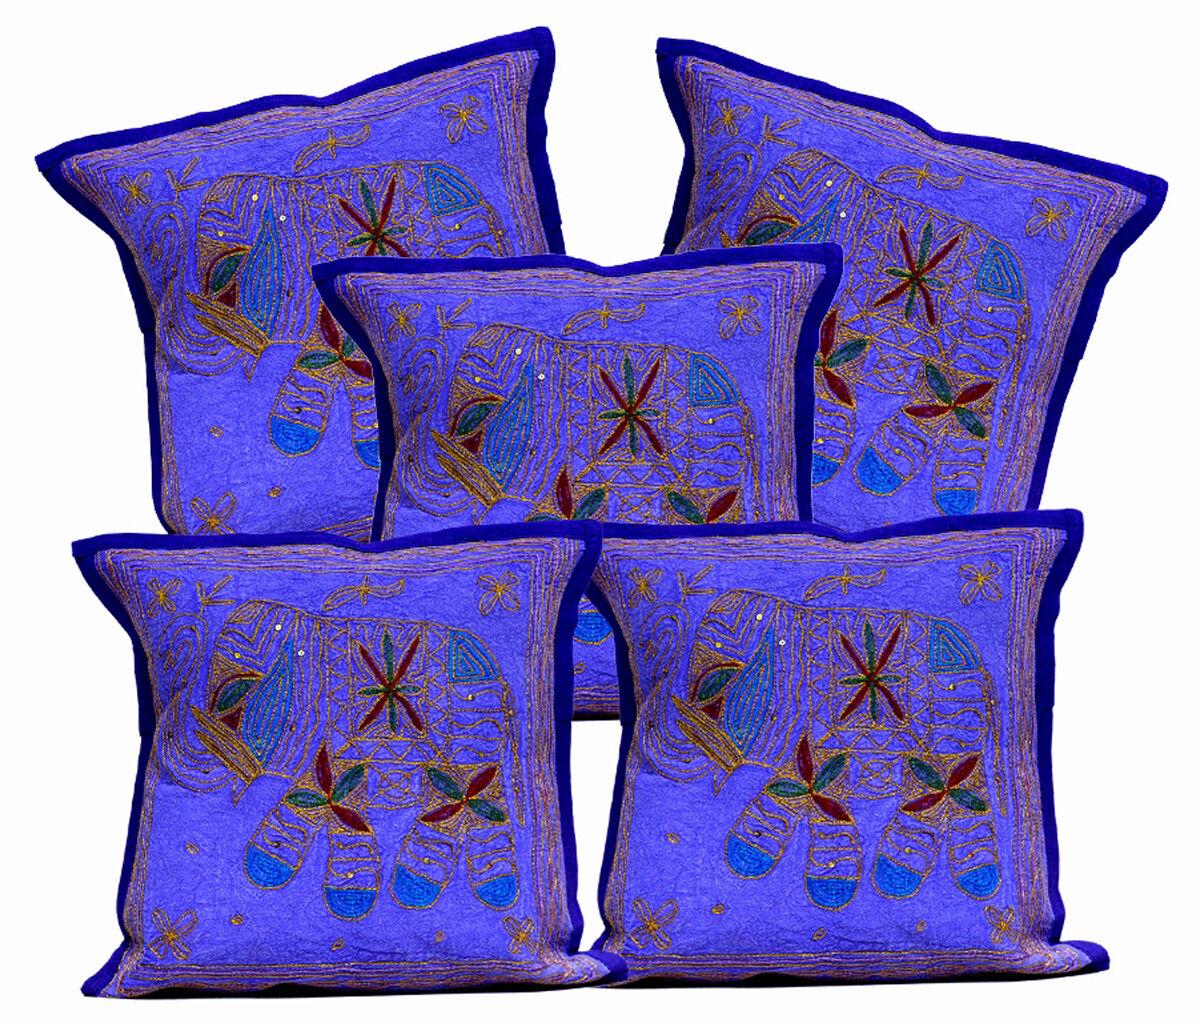 10Pcs Jari  Ethnic Elephant Decorative Cushion Indian Sequin Home Covers AIC840